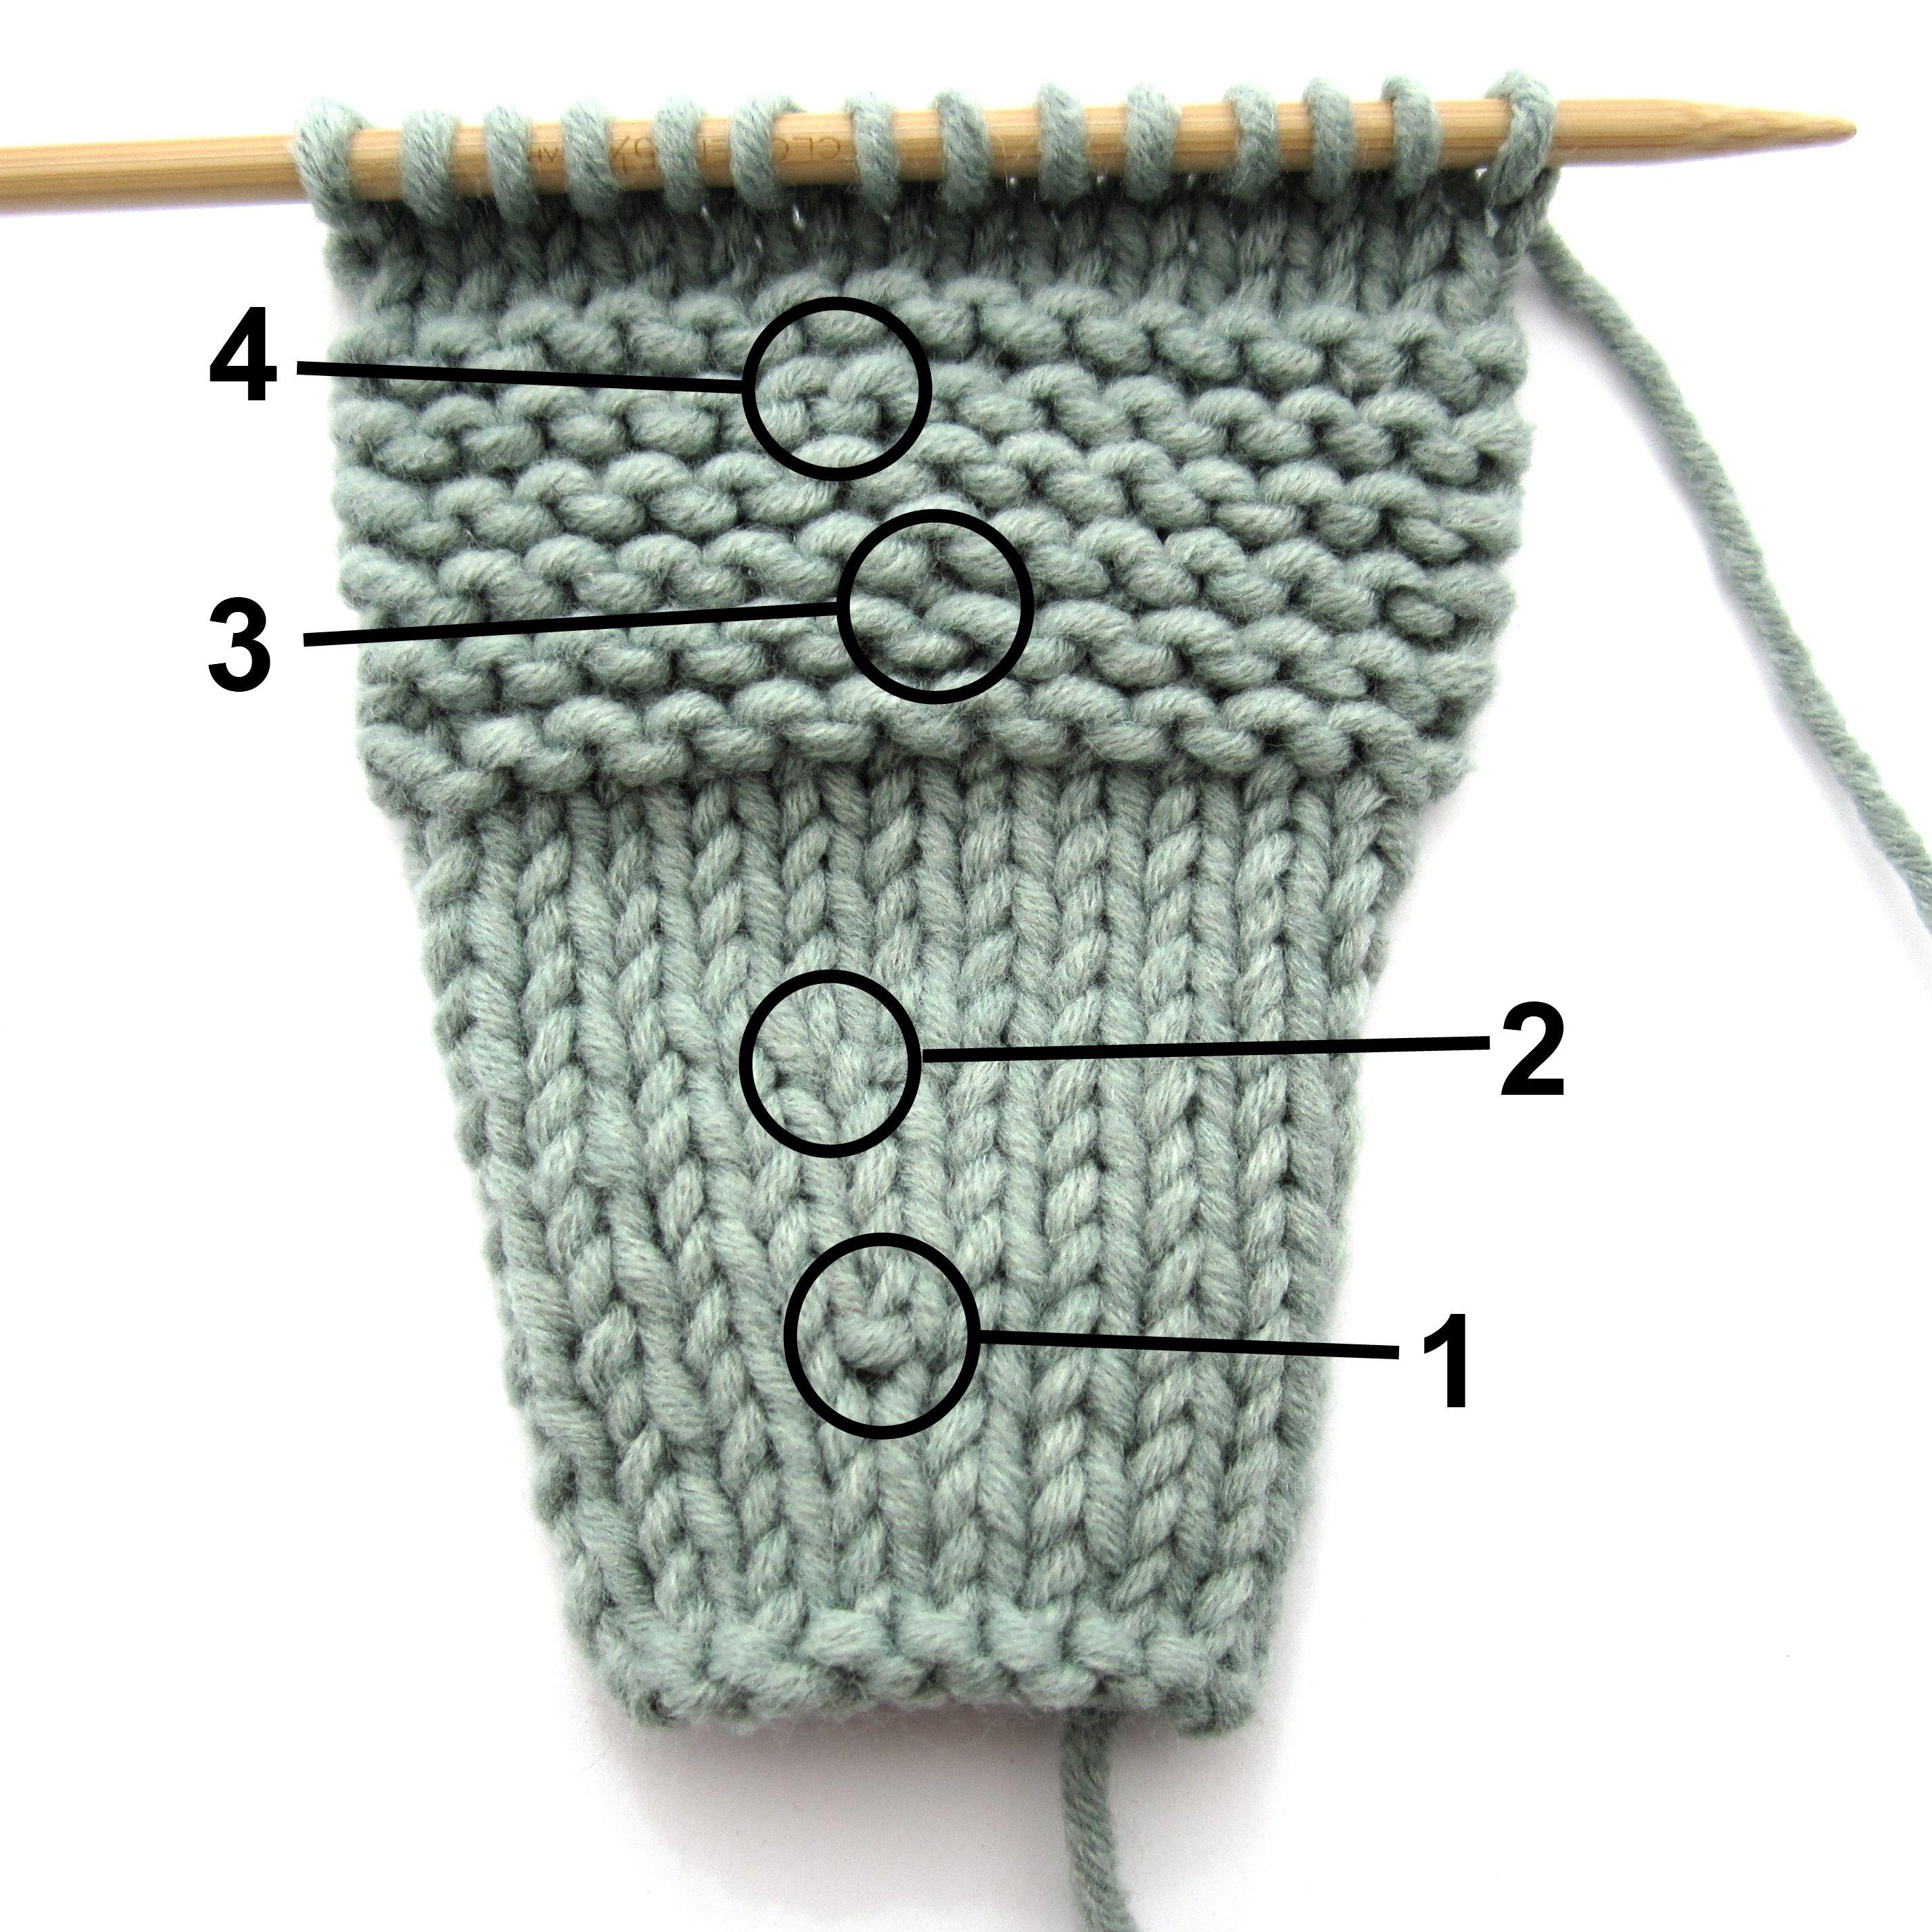 Kfb The Forgotten Increase Crochet And Knitting Knitting Knit